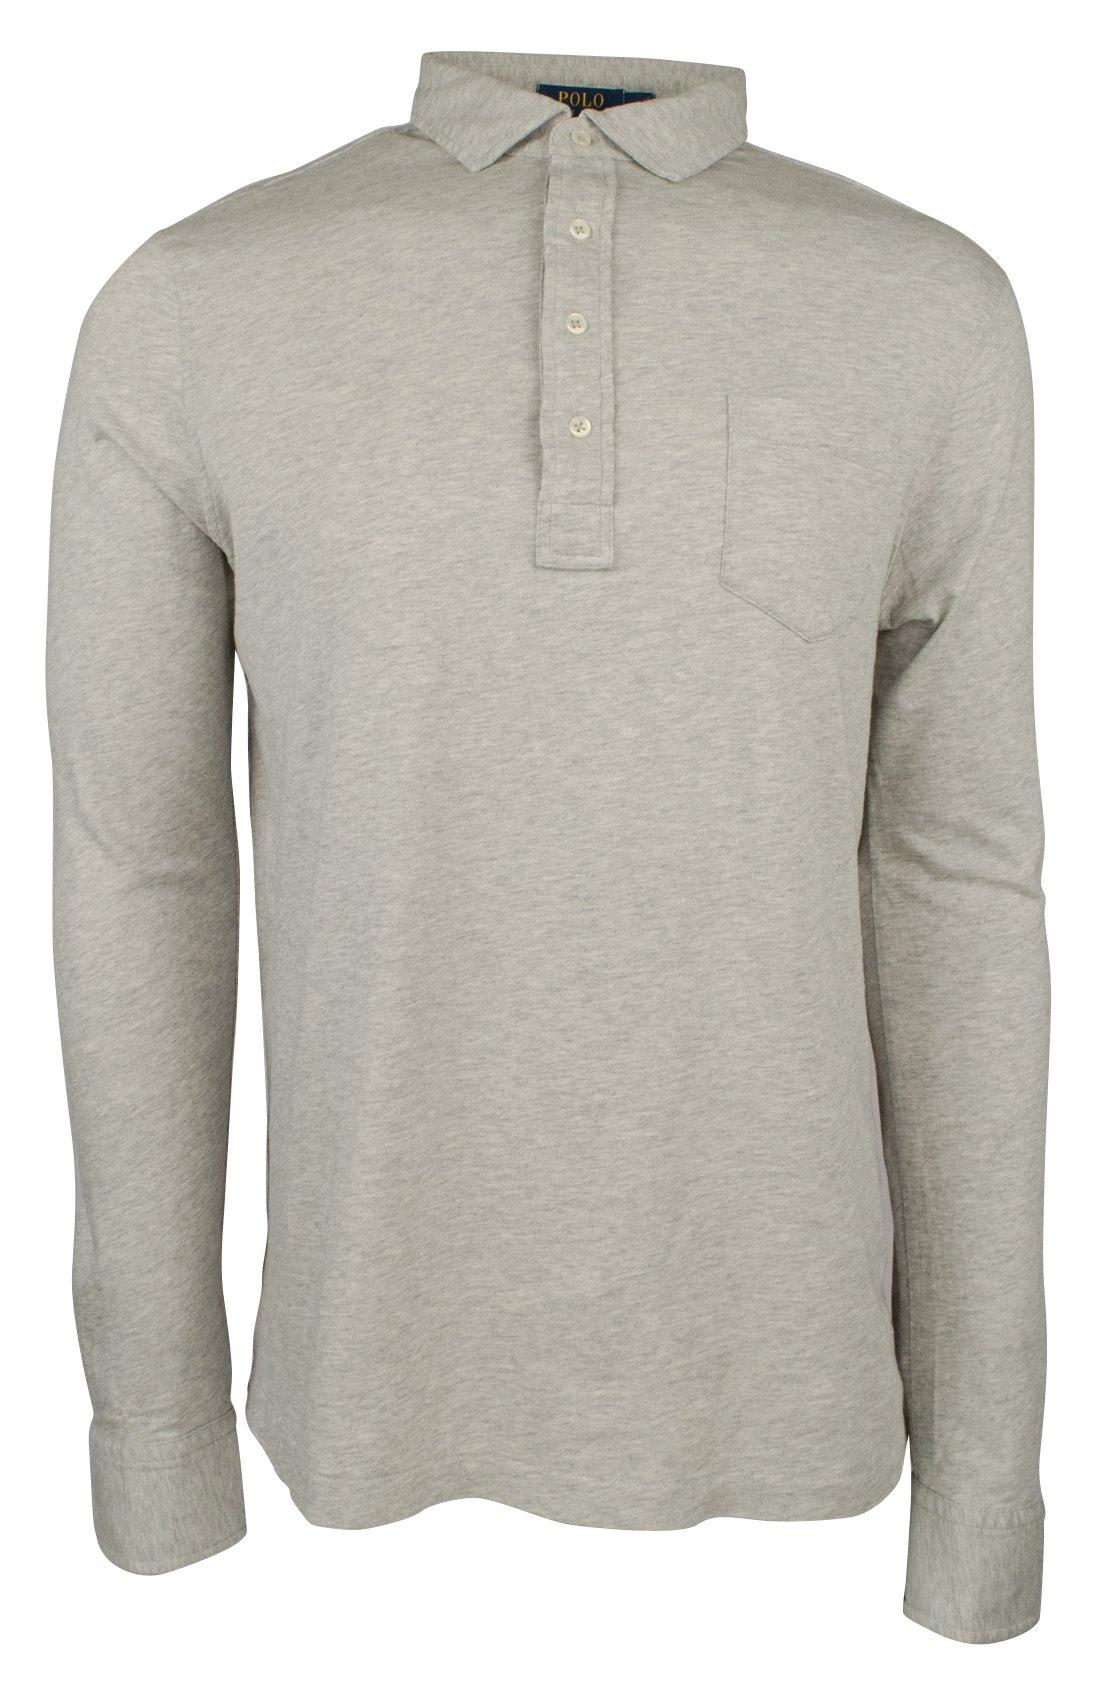 Polo Ralph Lauren Men's Hampton Cotton Jersey Shirt-Sh-M